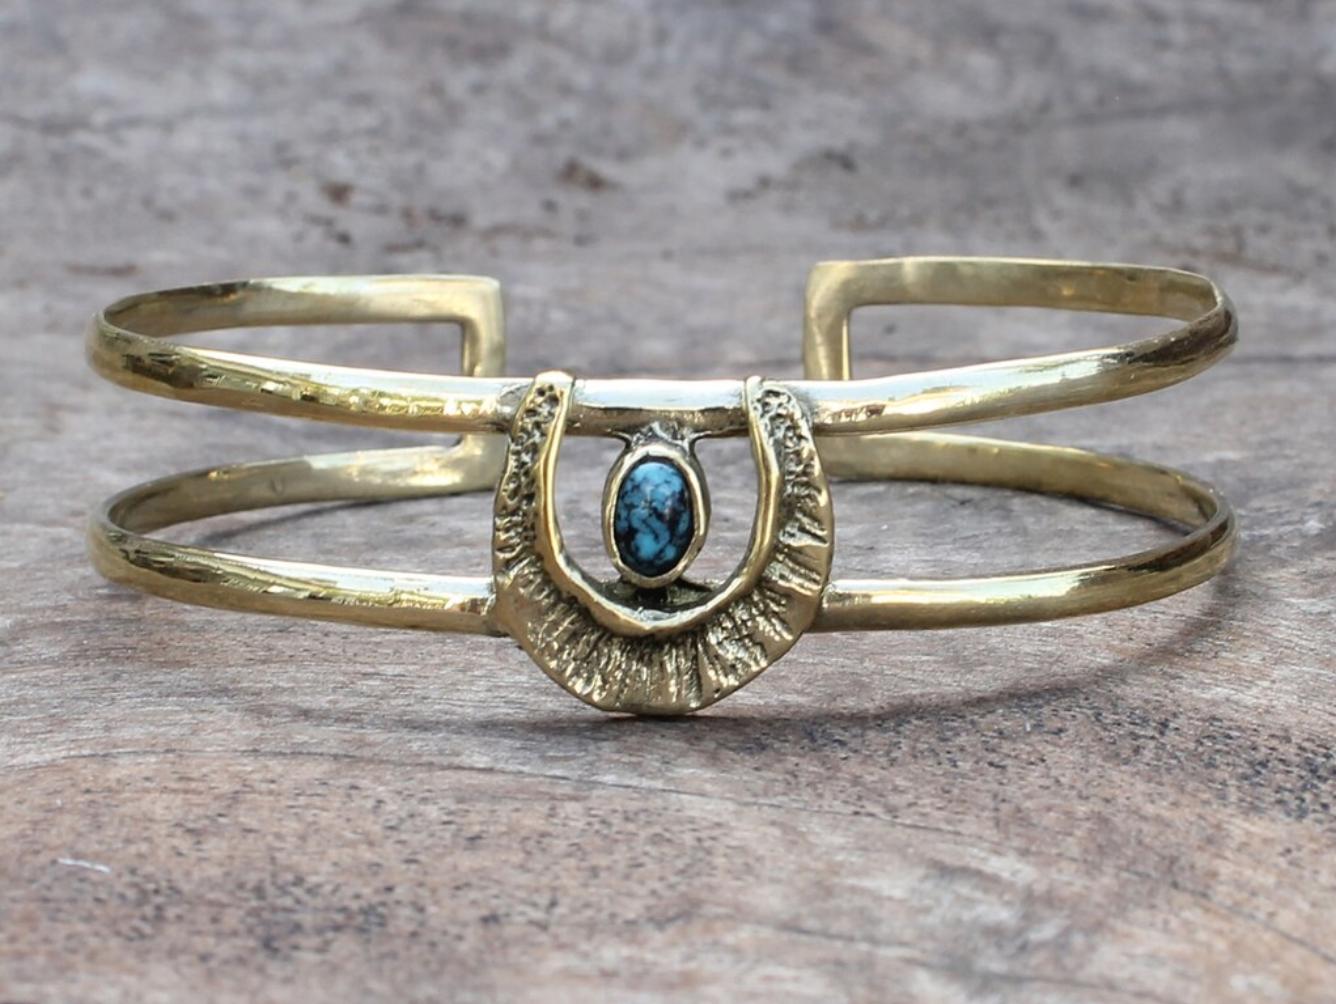 Bauxo Revere Brass Bracelet with Turquoise